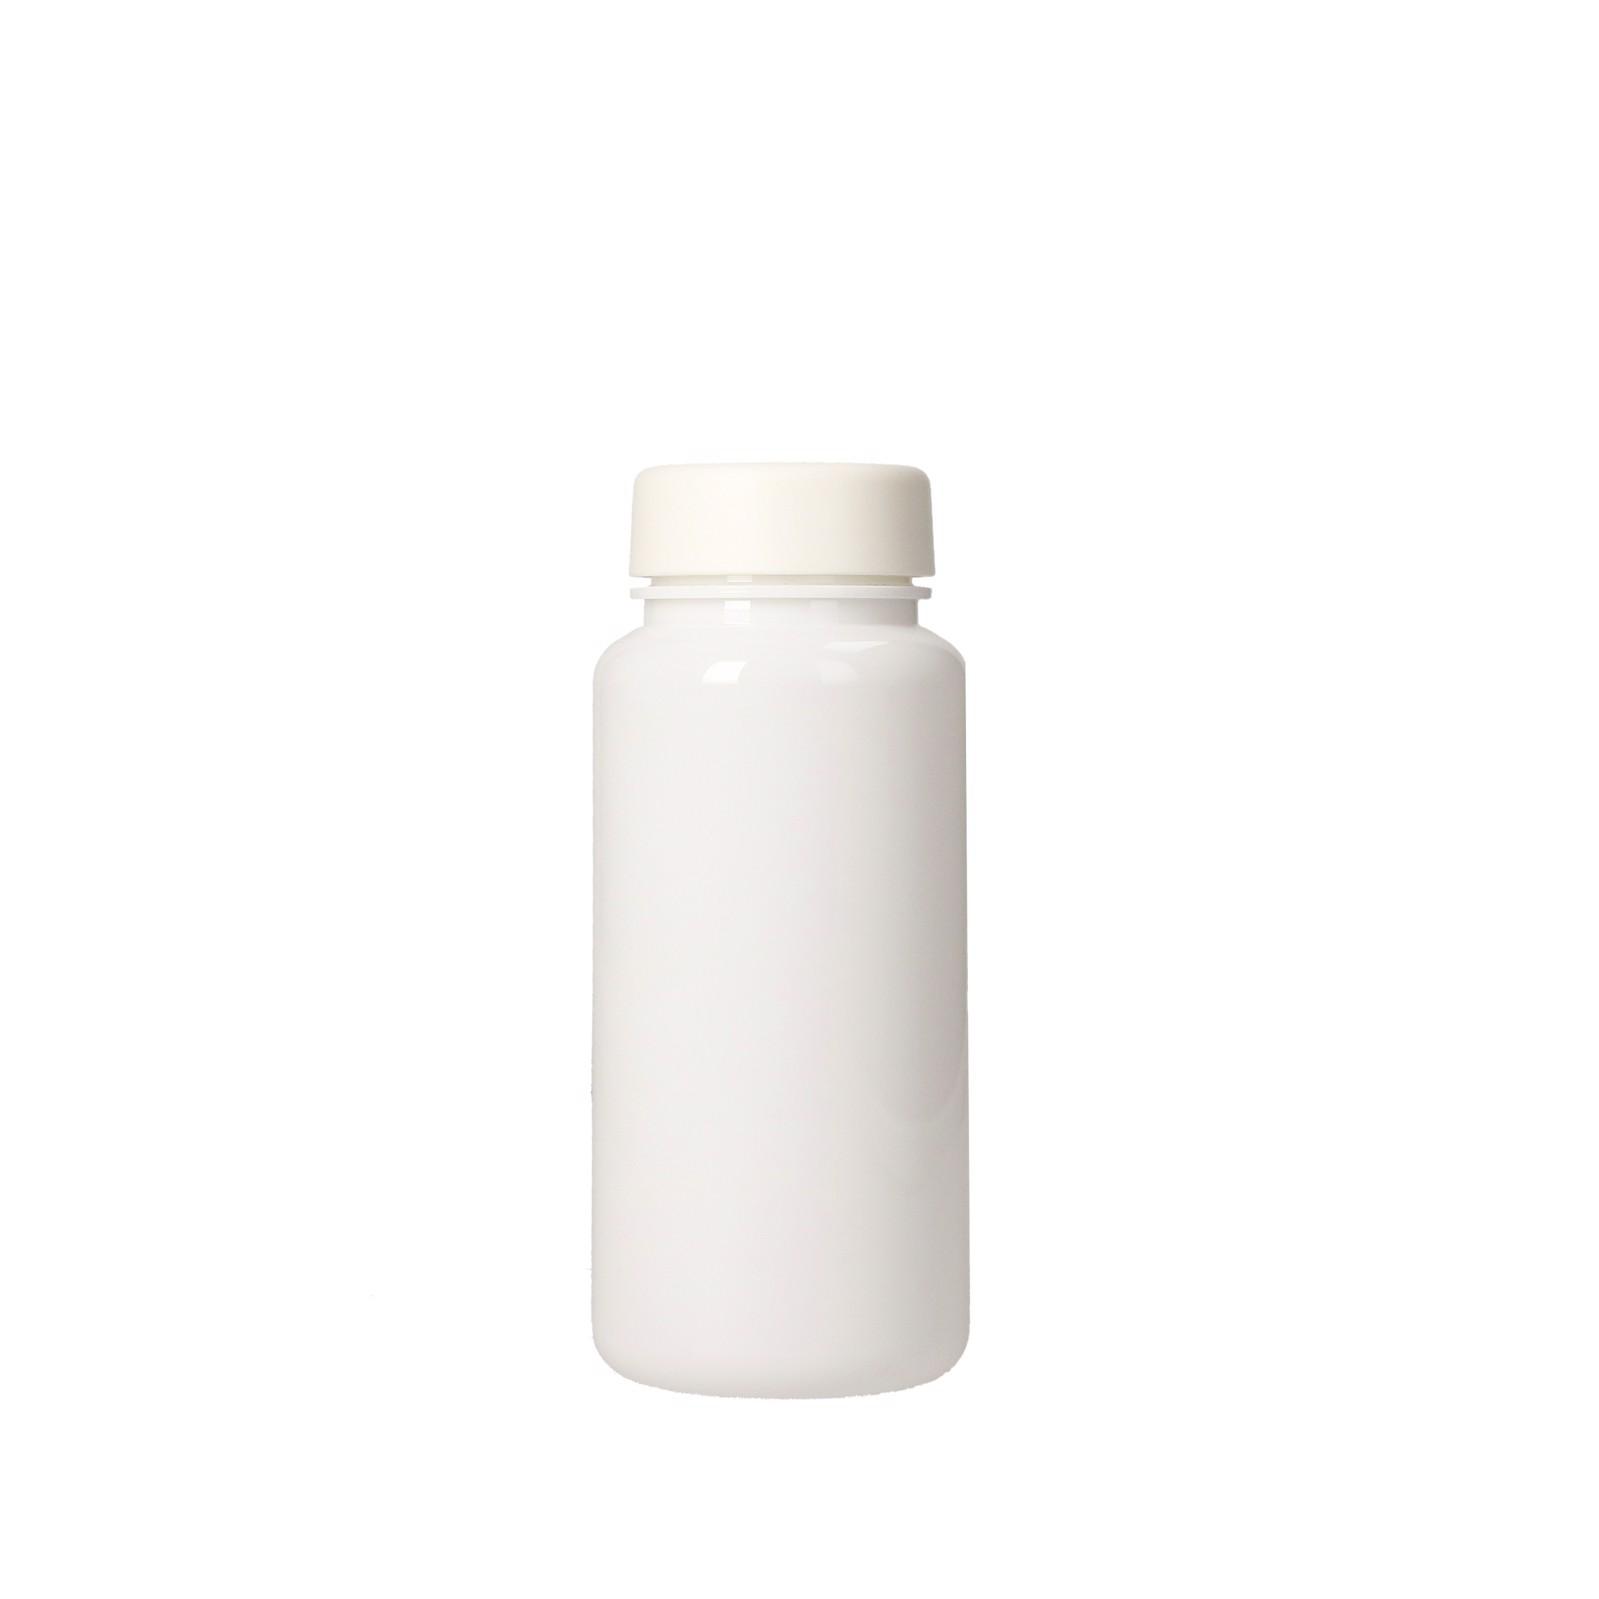 "Drink Bottle ""Refresh"" Colour, 0.4 L - White / White"